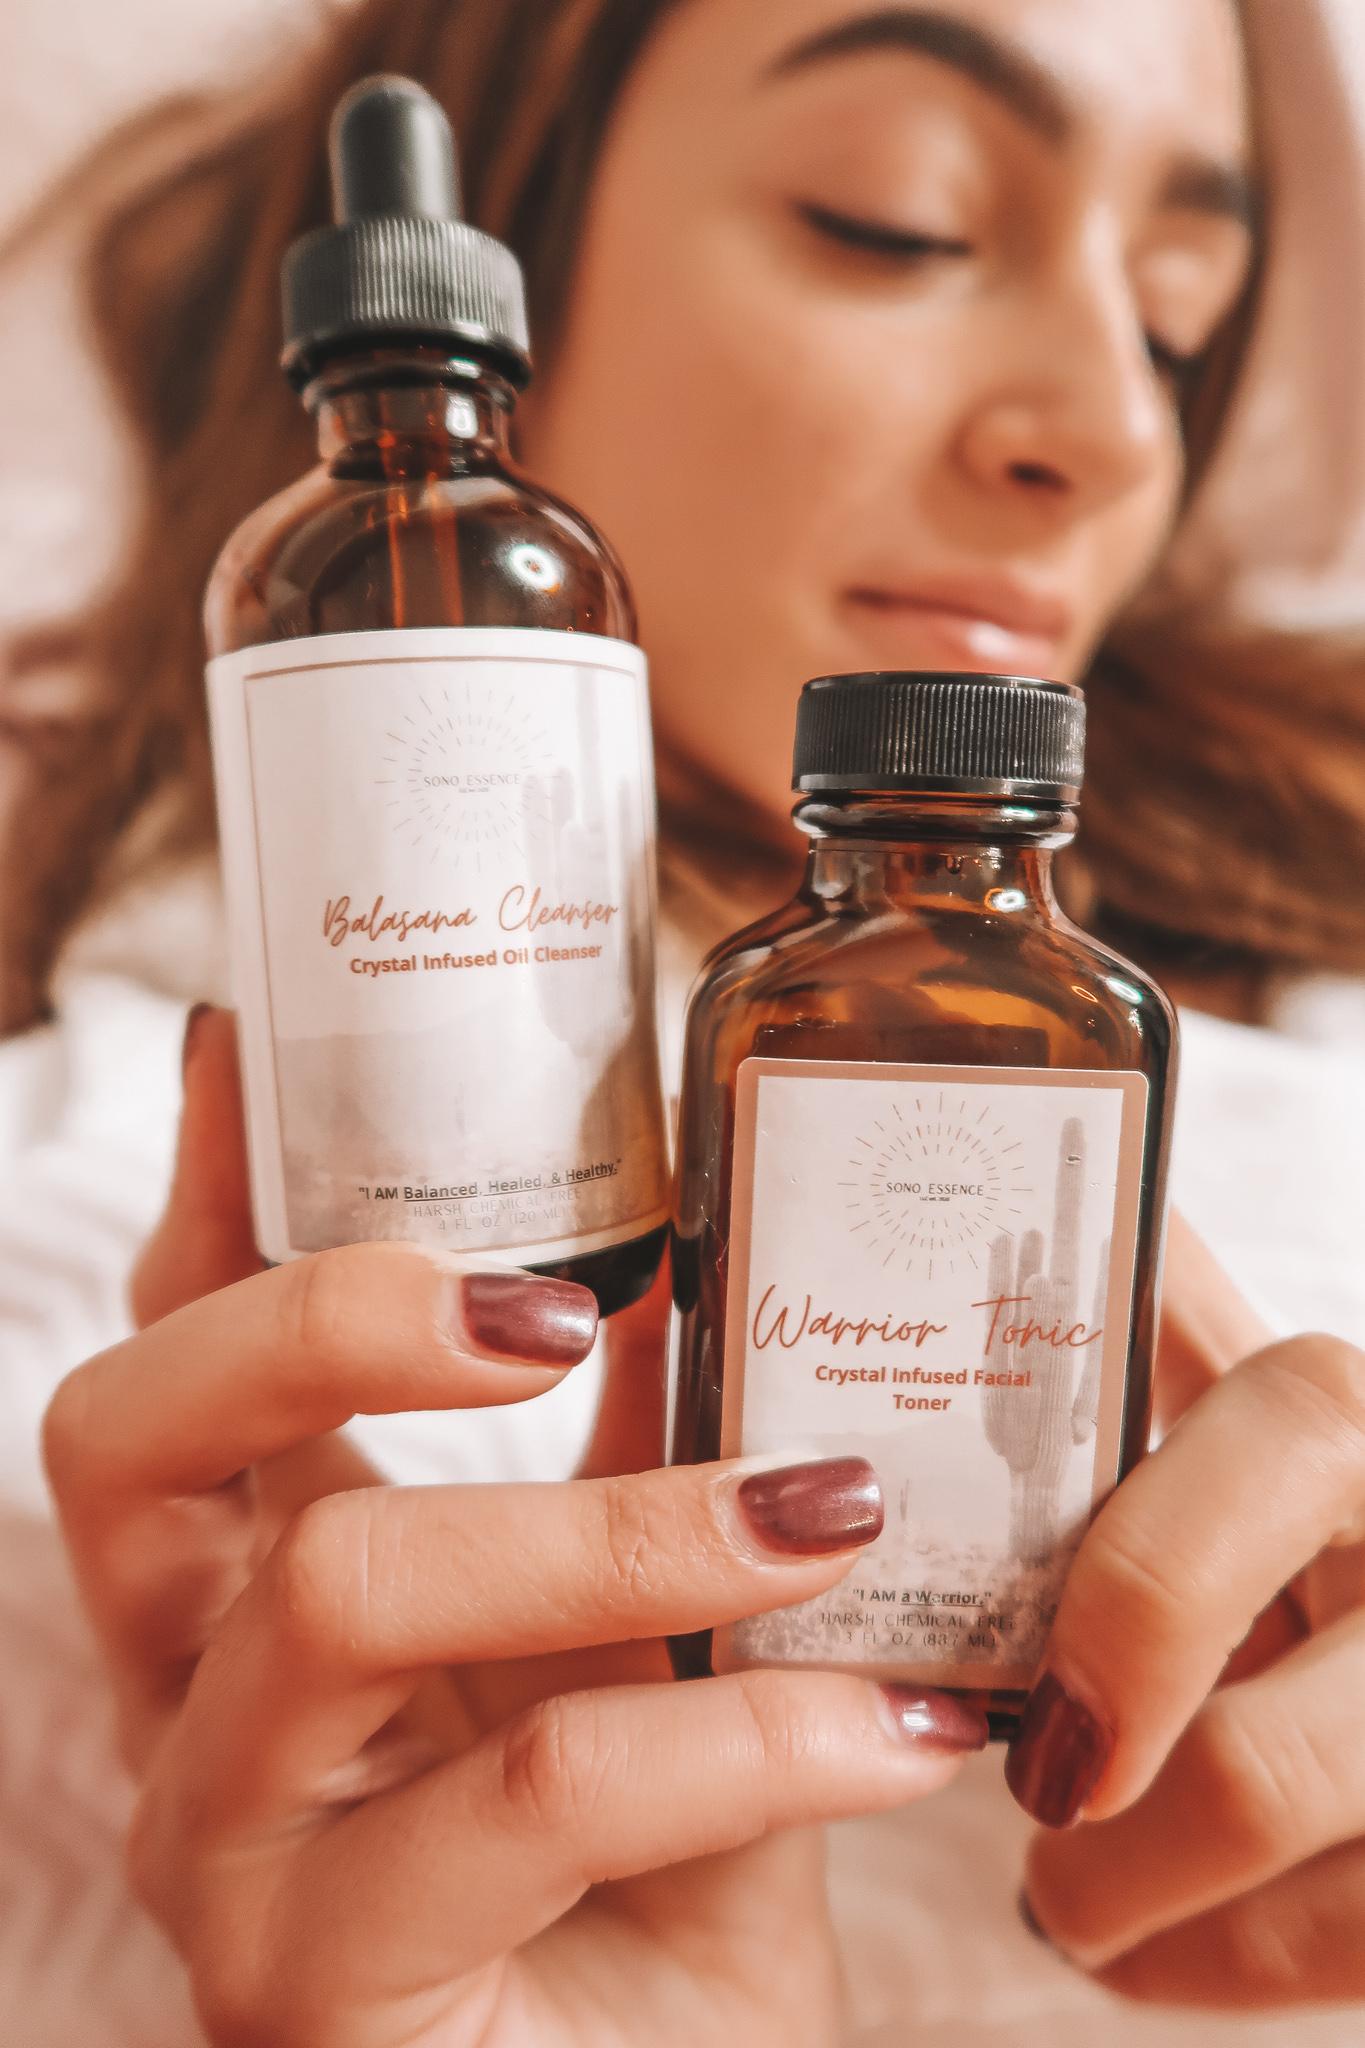 Sono Essence Balasana Cleanser Warrior Tonic Crystal Infused Luxury Skincare